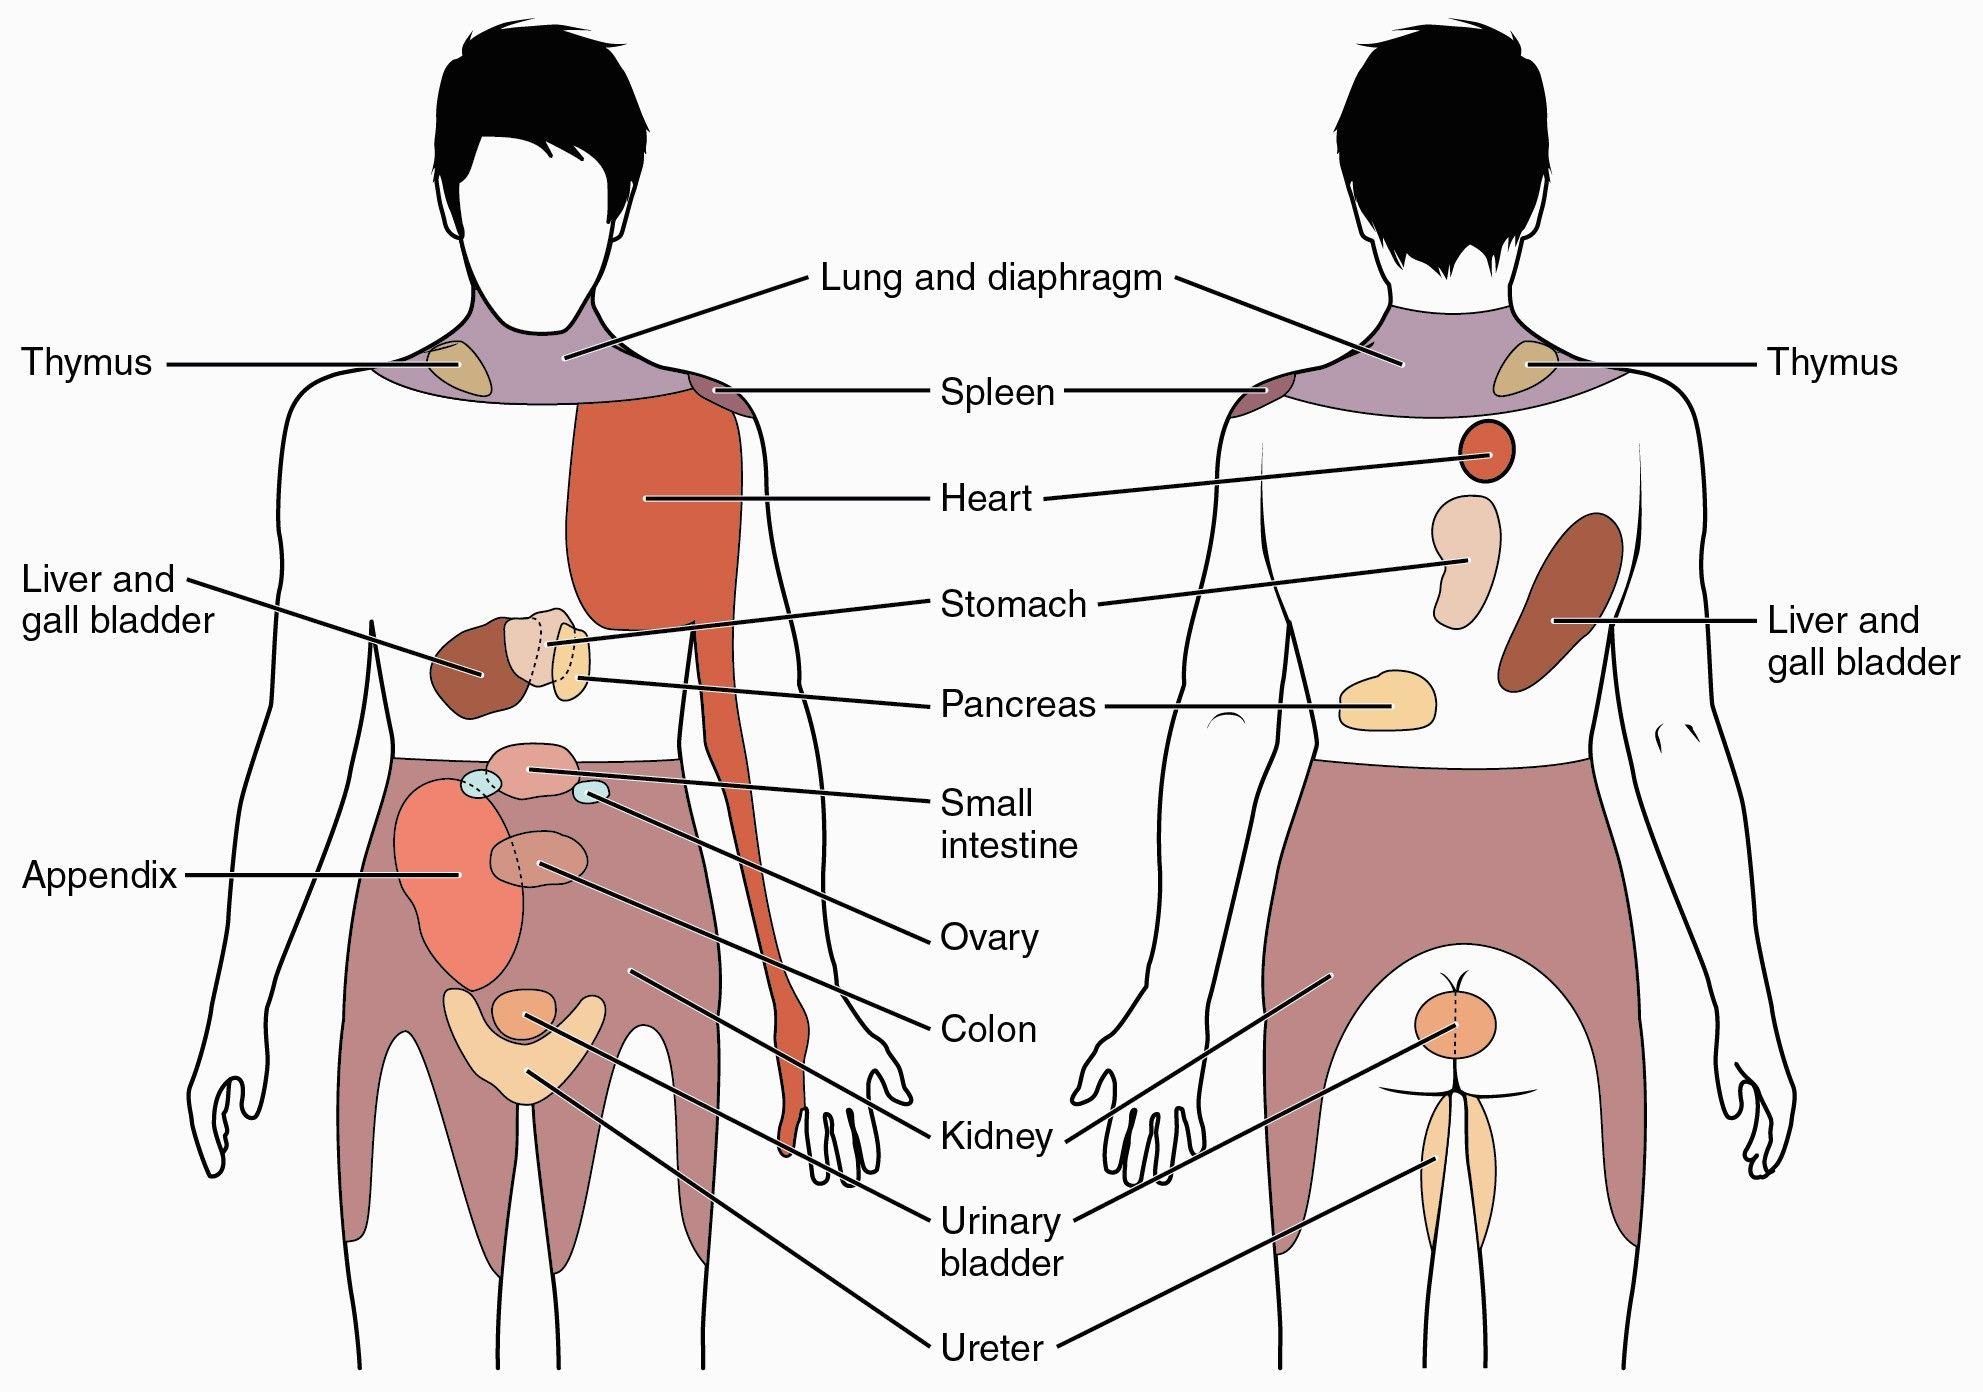 Anatomy Of Body Pain Liver Pain Location Diagram Anatomy Organ